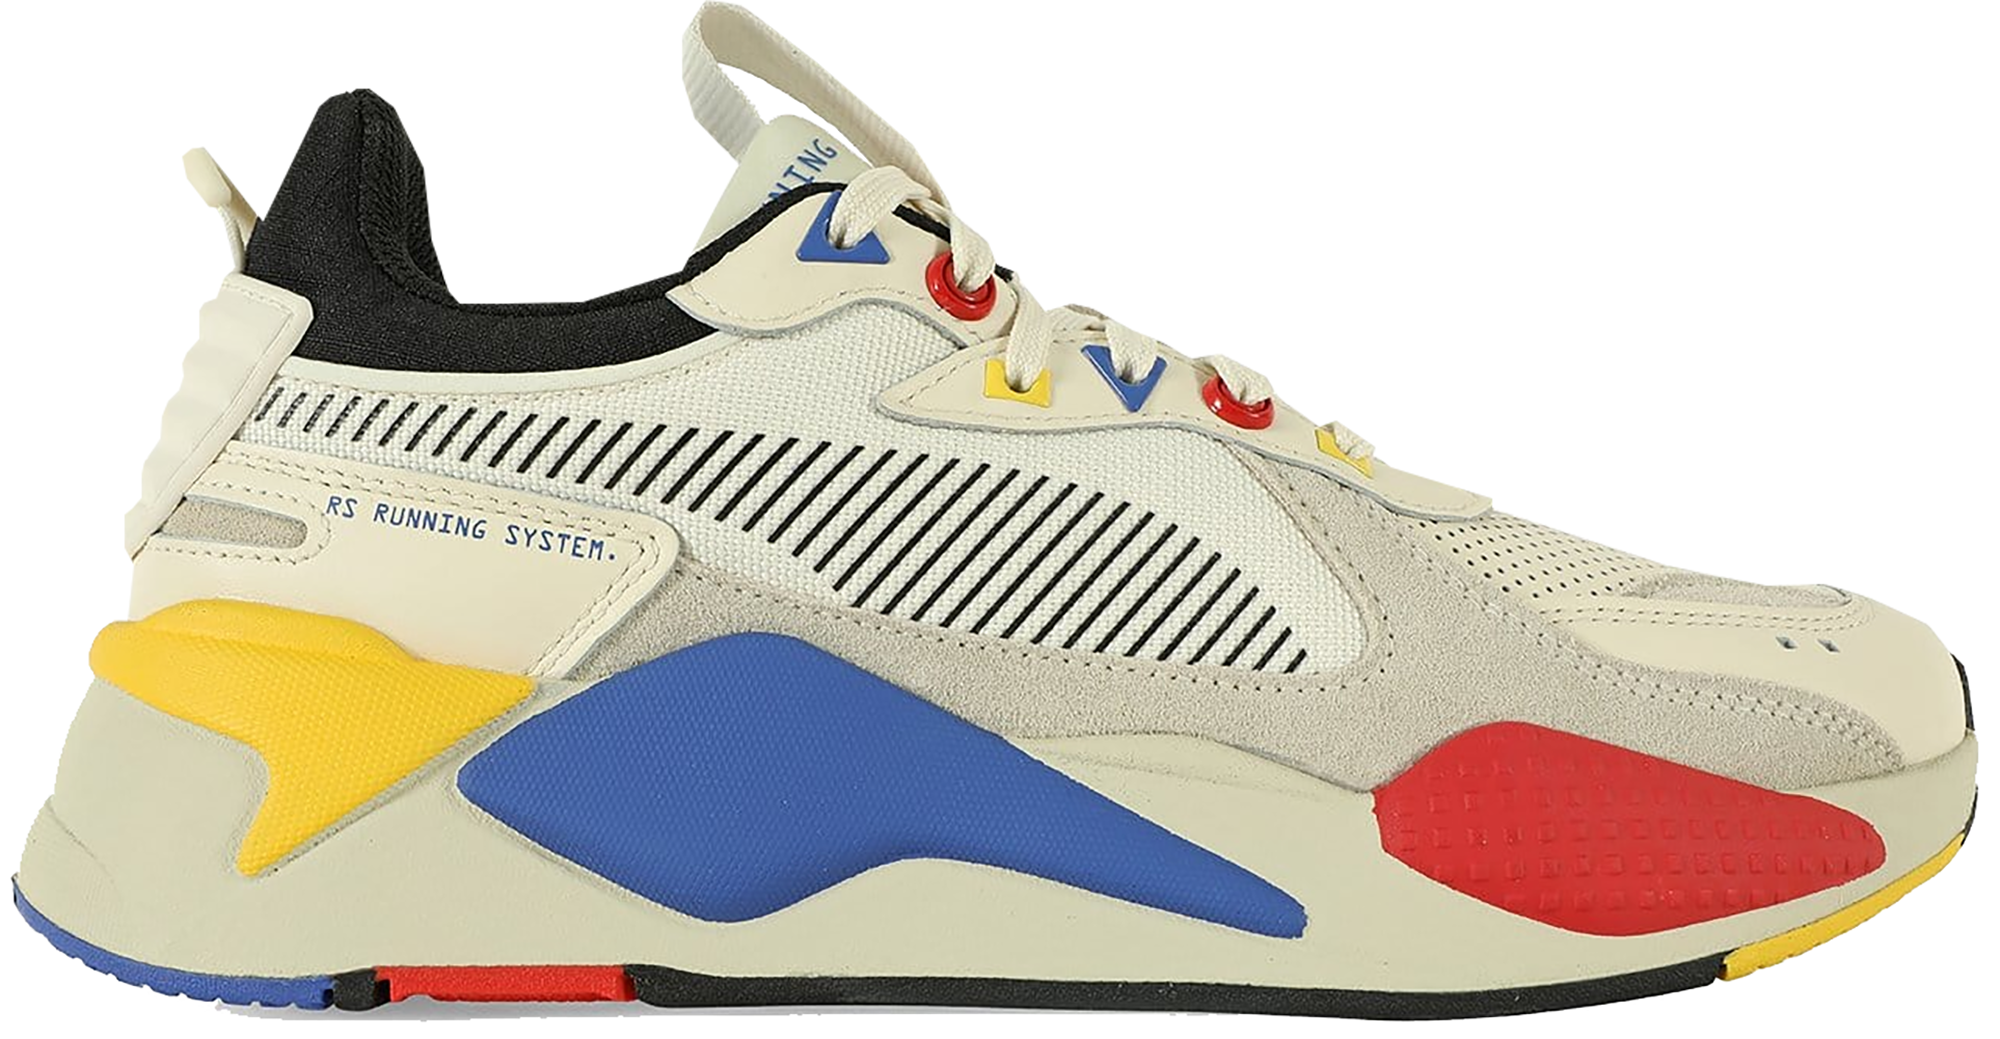 Puma RS-X Color Theory - 370920-01